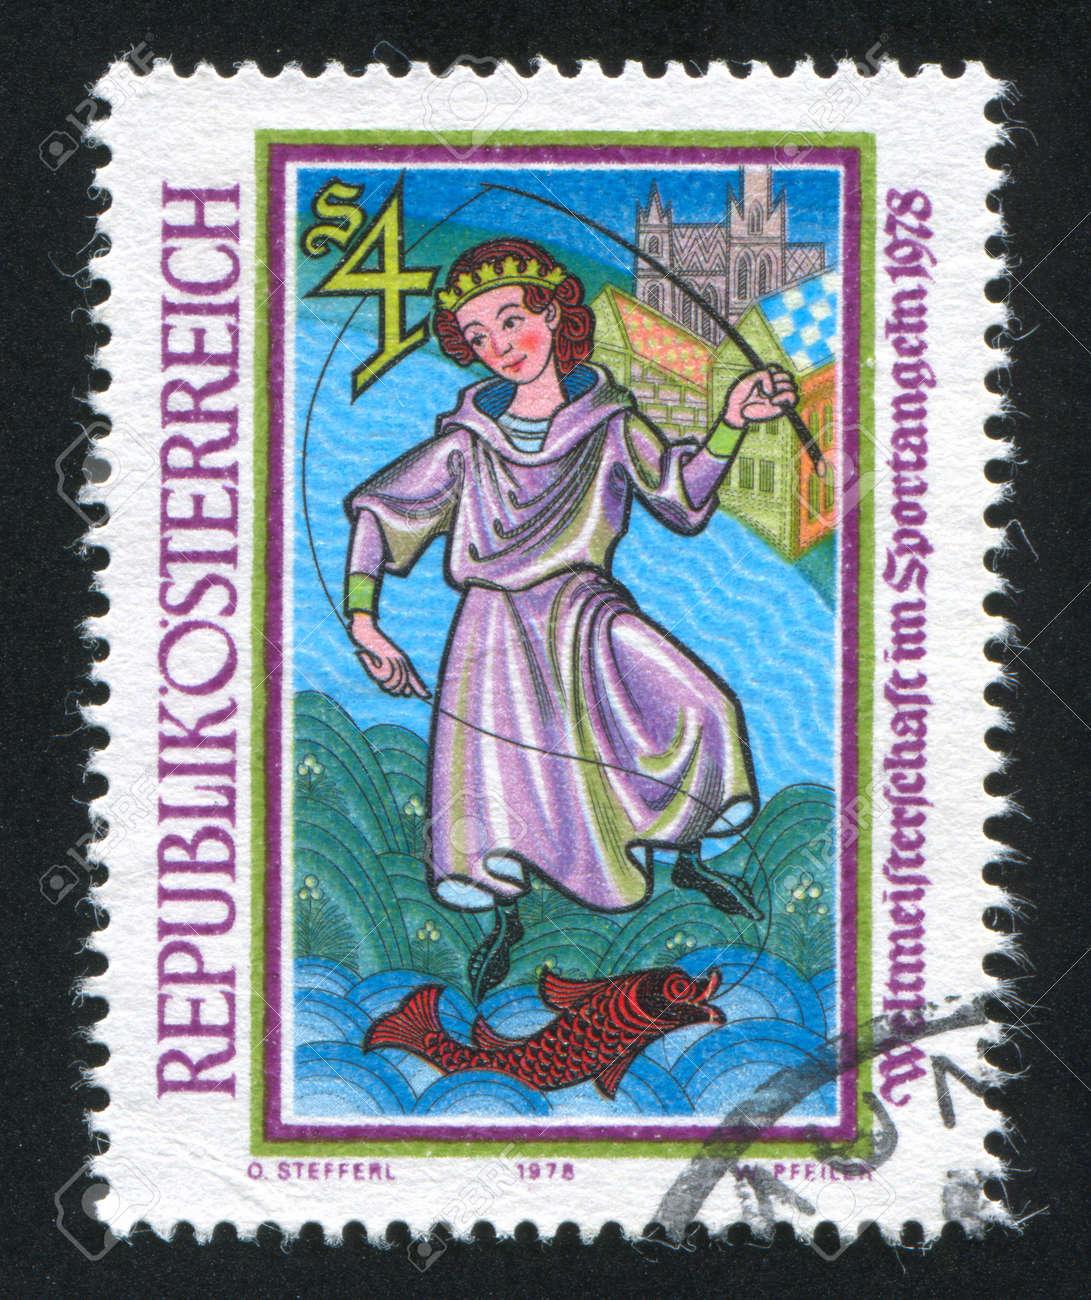 AUSTRIA - CIRCA 1978: stamp printed by Austria, shows Empreror Maximilian Fishing, circa 1978 Stock Photo - 18329738